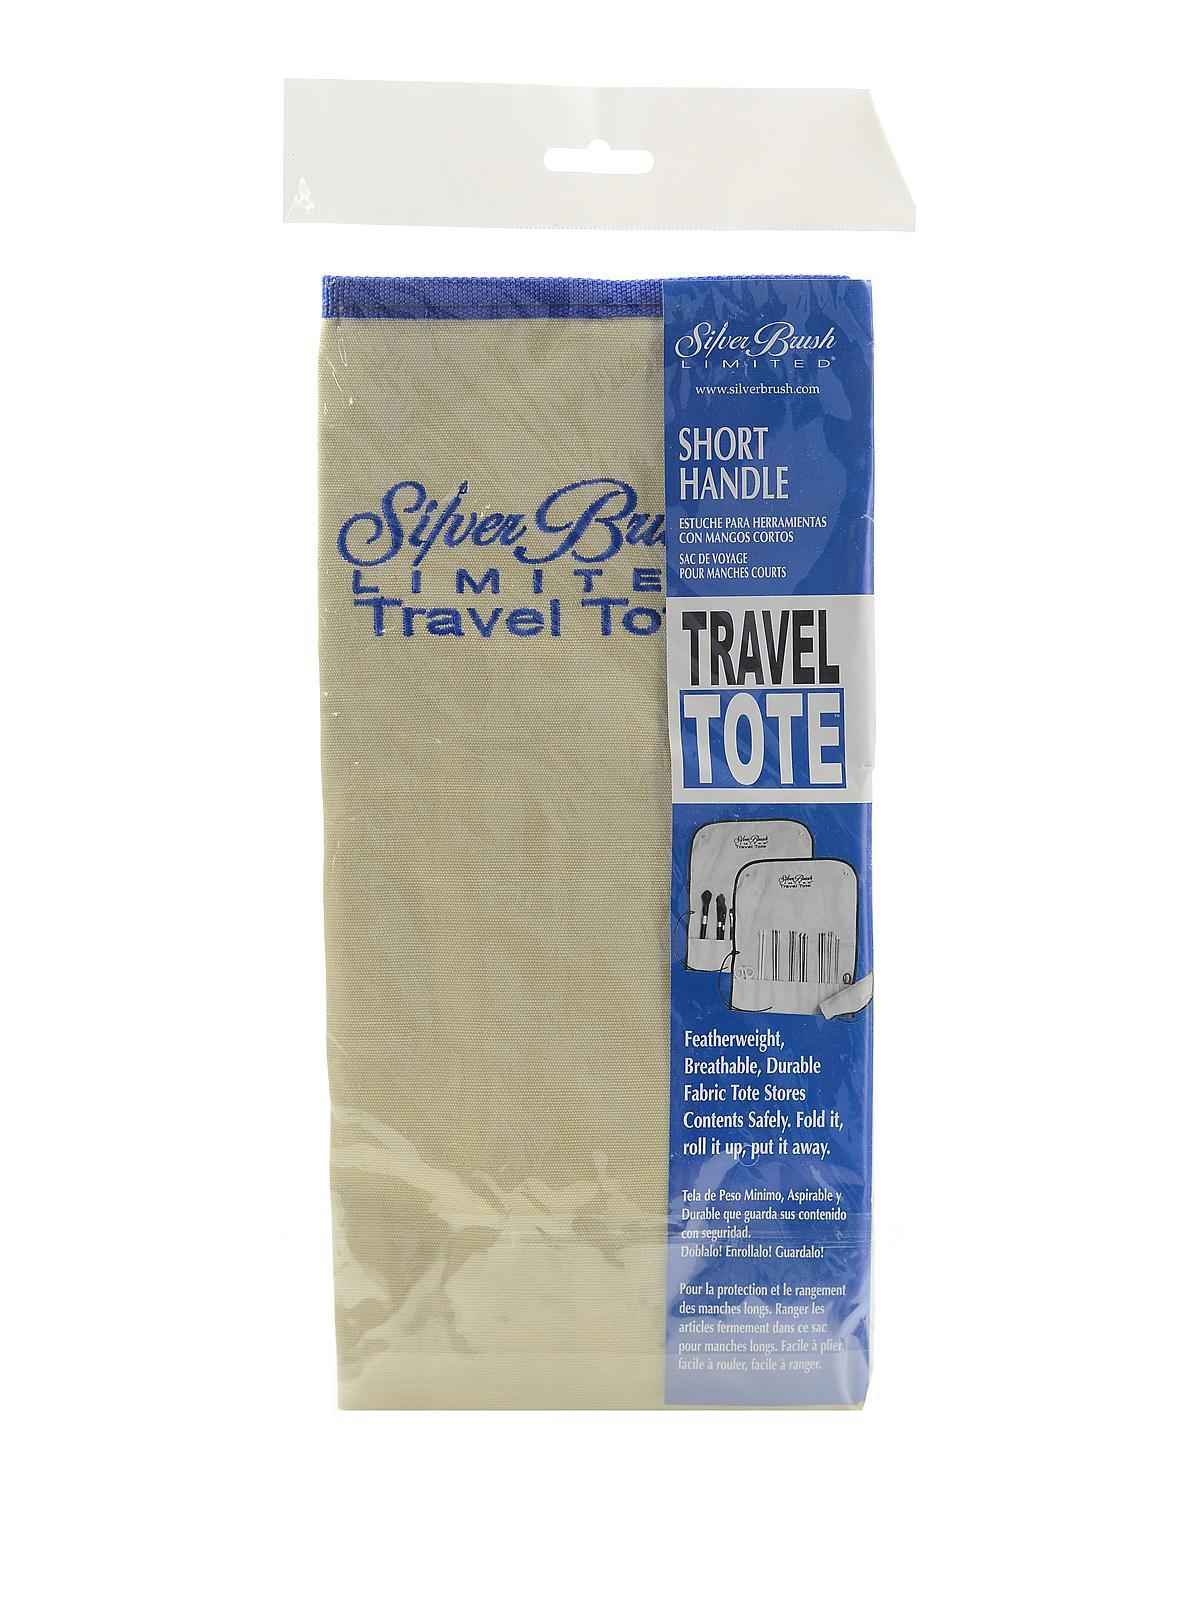 Brush Travel Totes